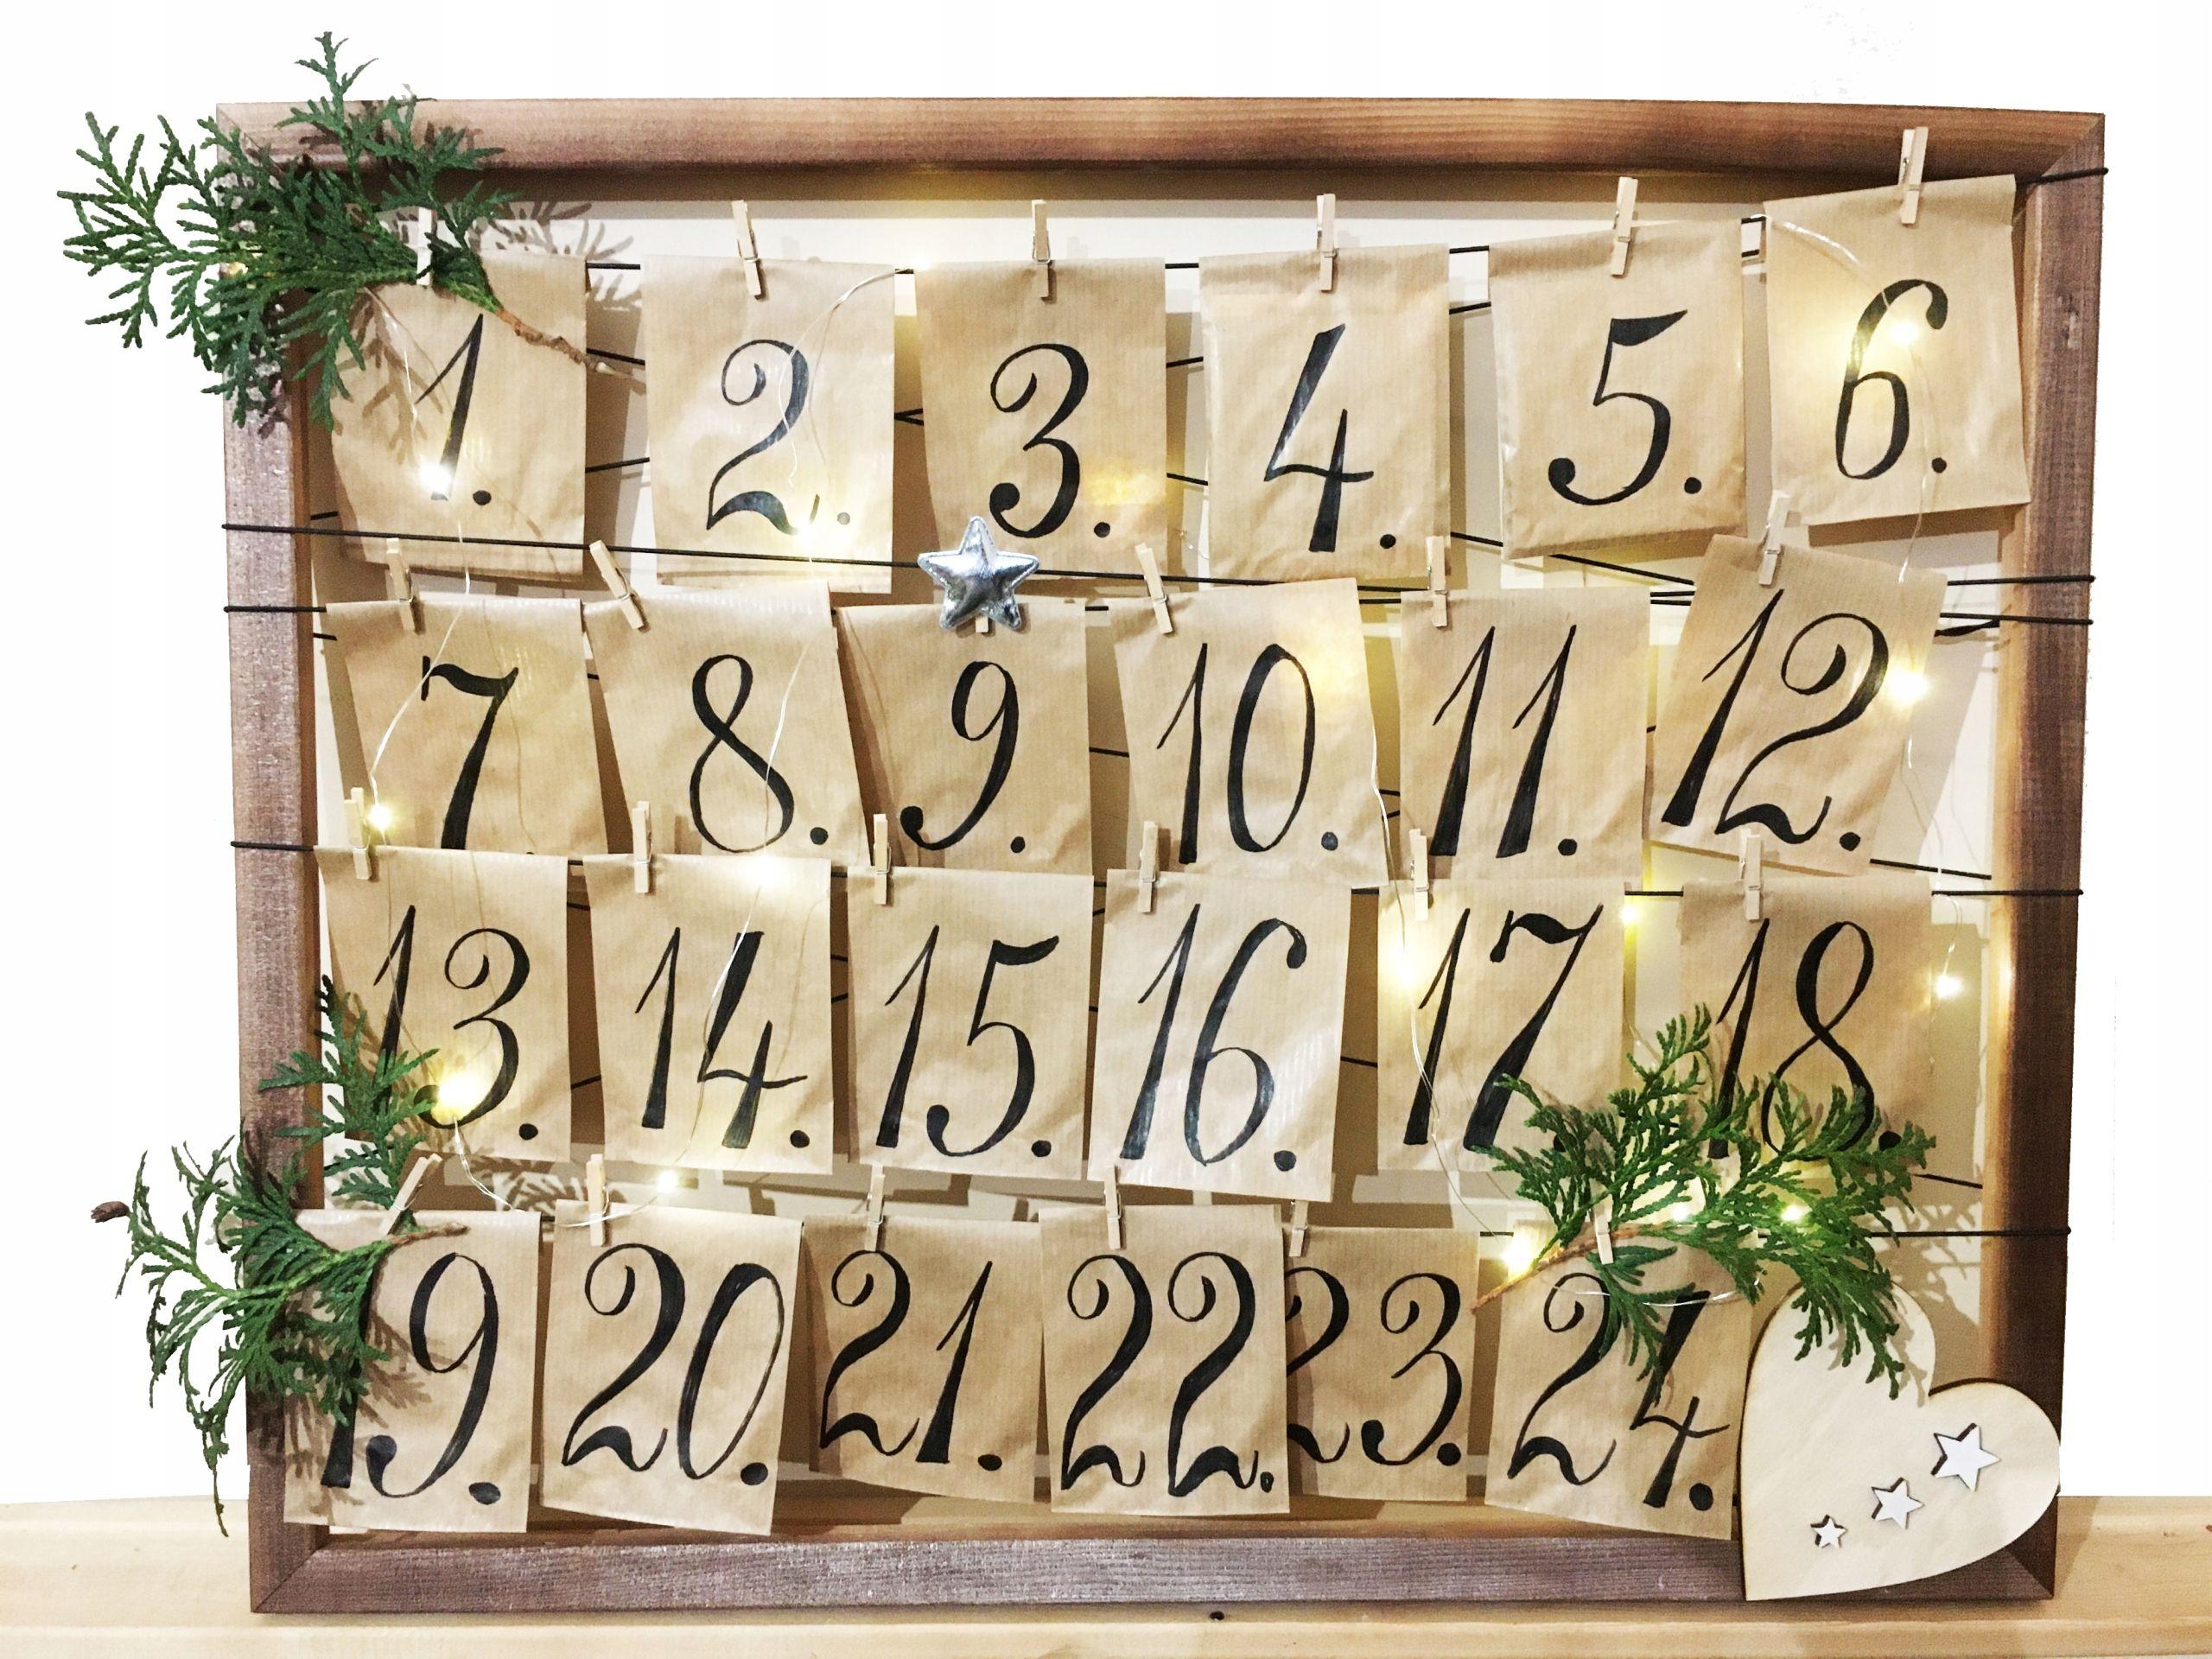 Kalendarz Adwentowy Herbata Prezent Swieta Mikolaj 8729272641 Oficjalne Archiwum Allegro Xmas Diy Calendar Advent Calendar